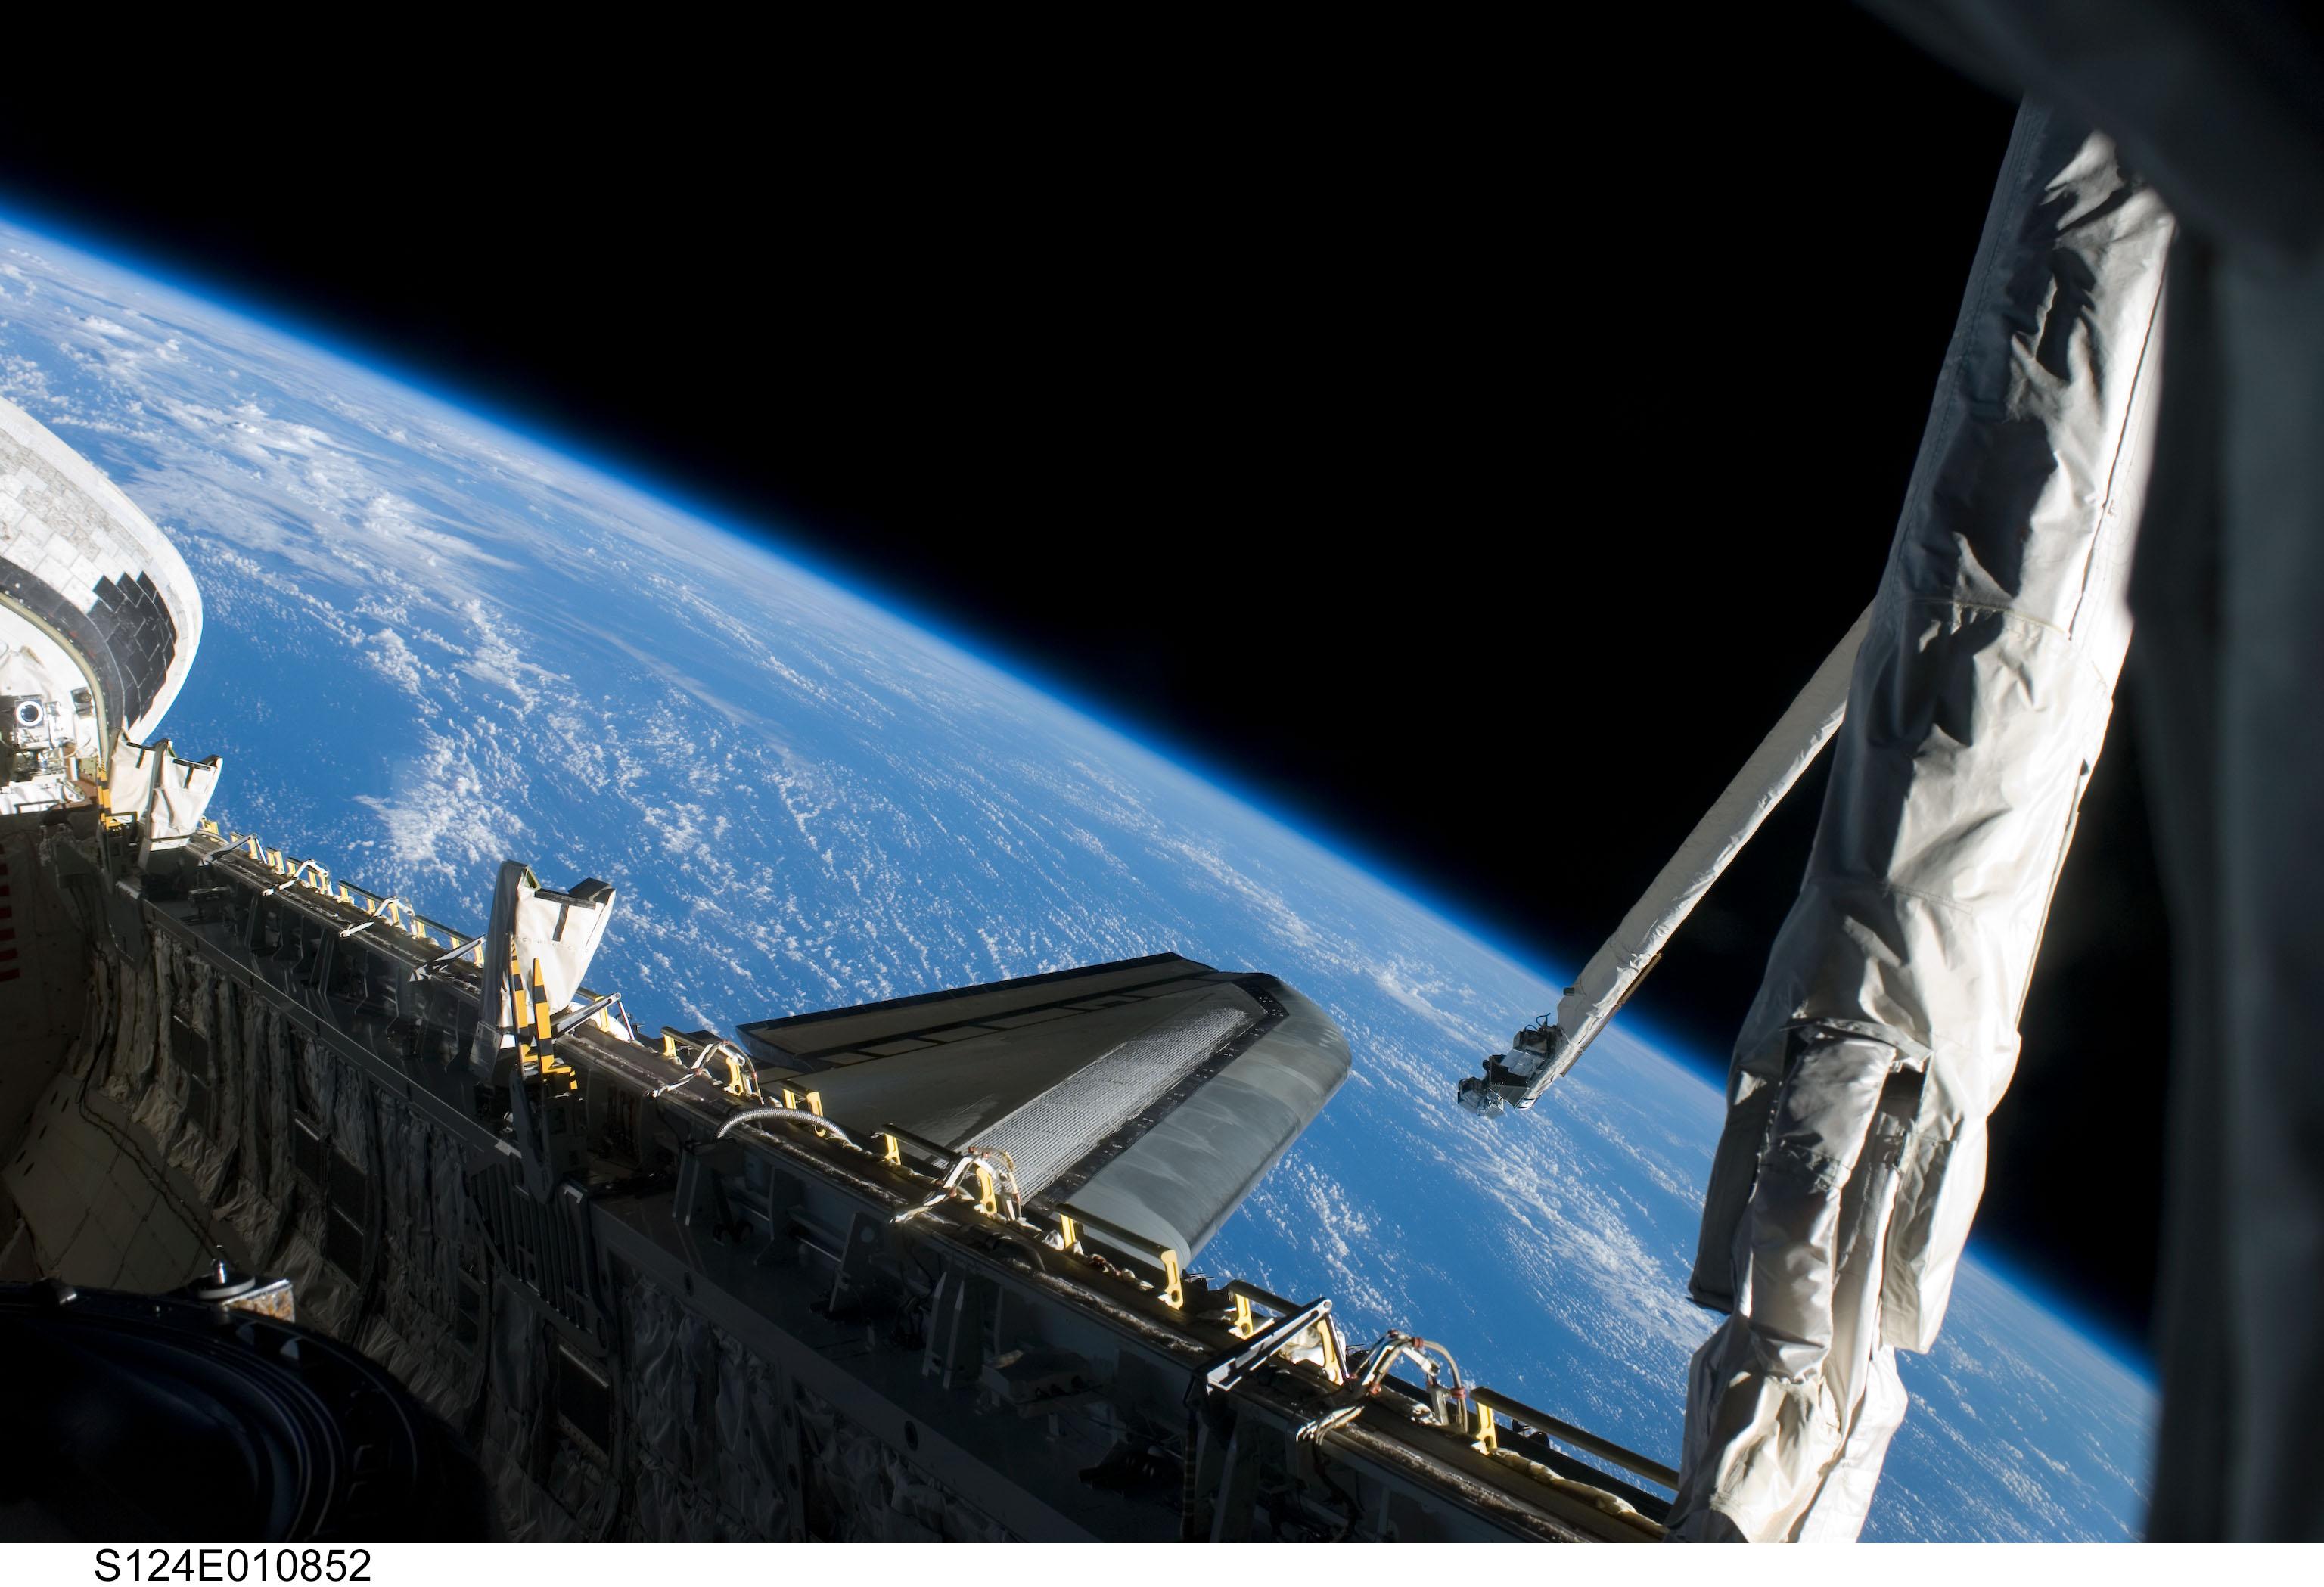 benefits of space shuttle program - photo #20